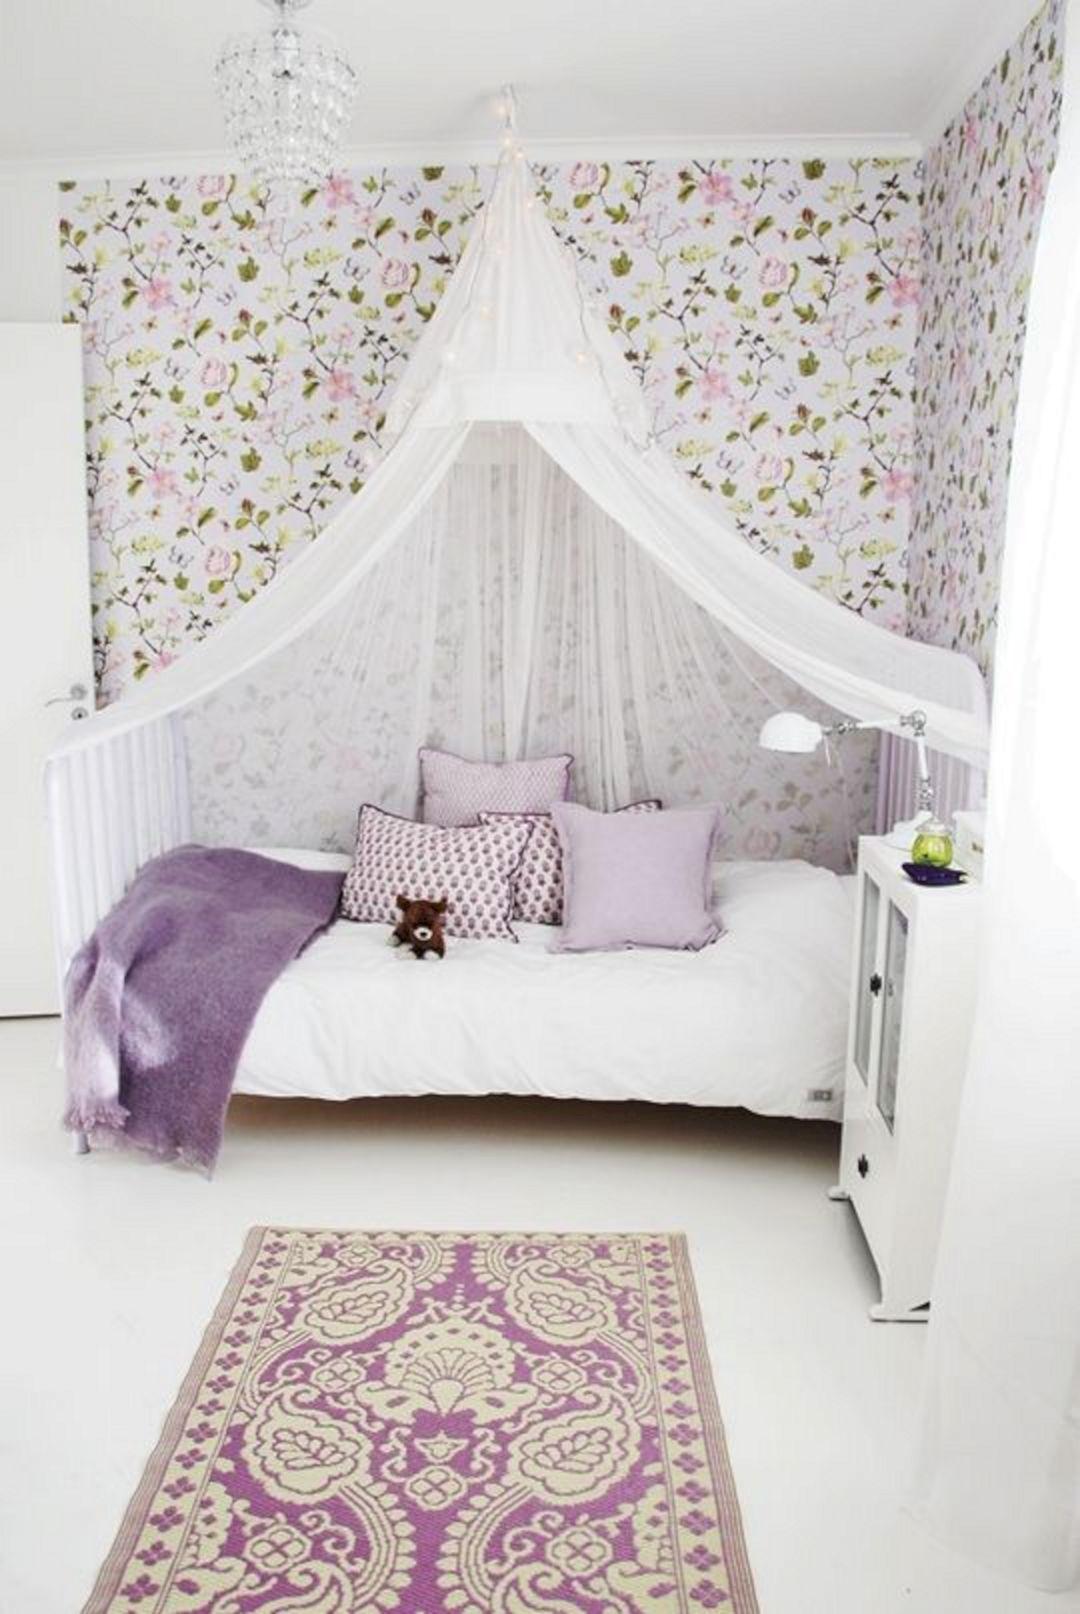 Little Girls Room Canopy Bed 22 Little Girls Room Canopy